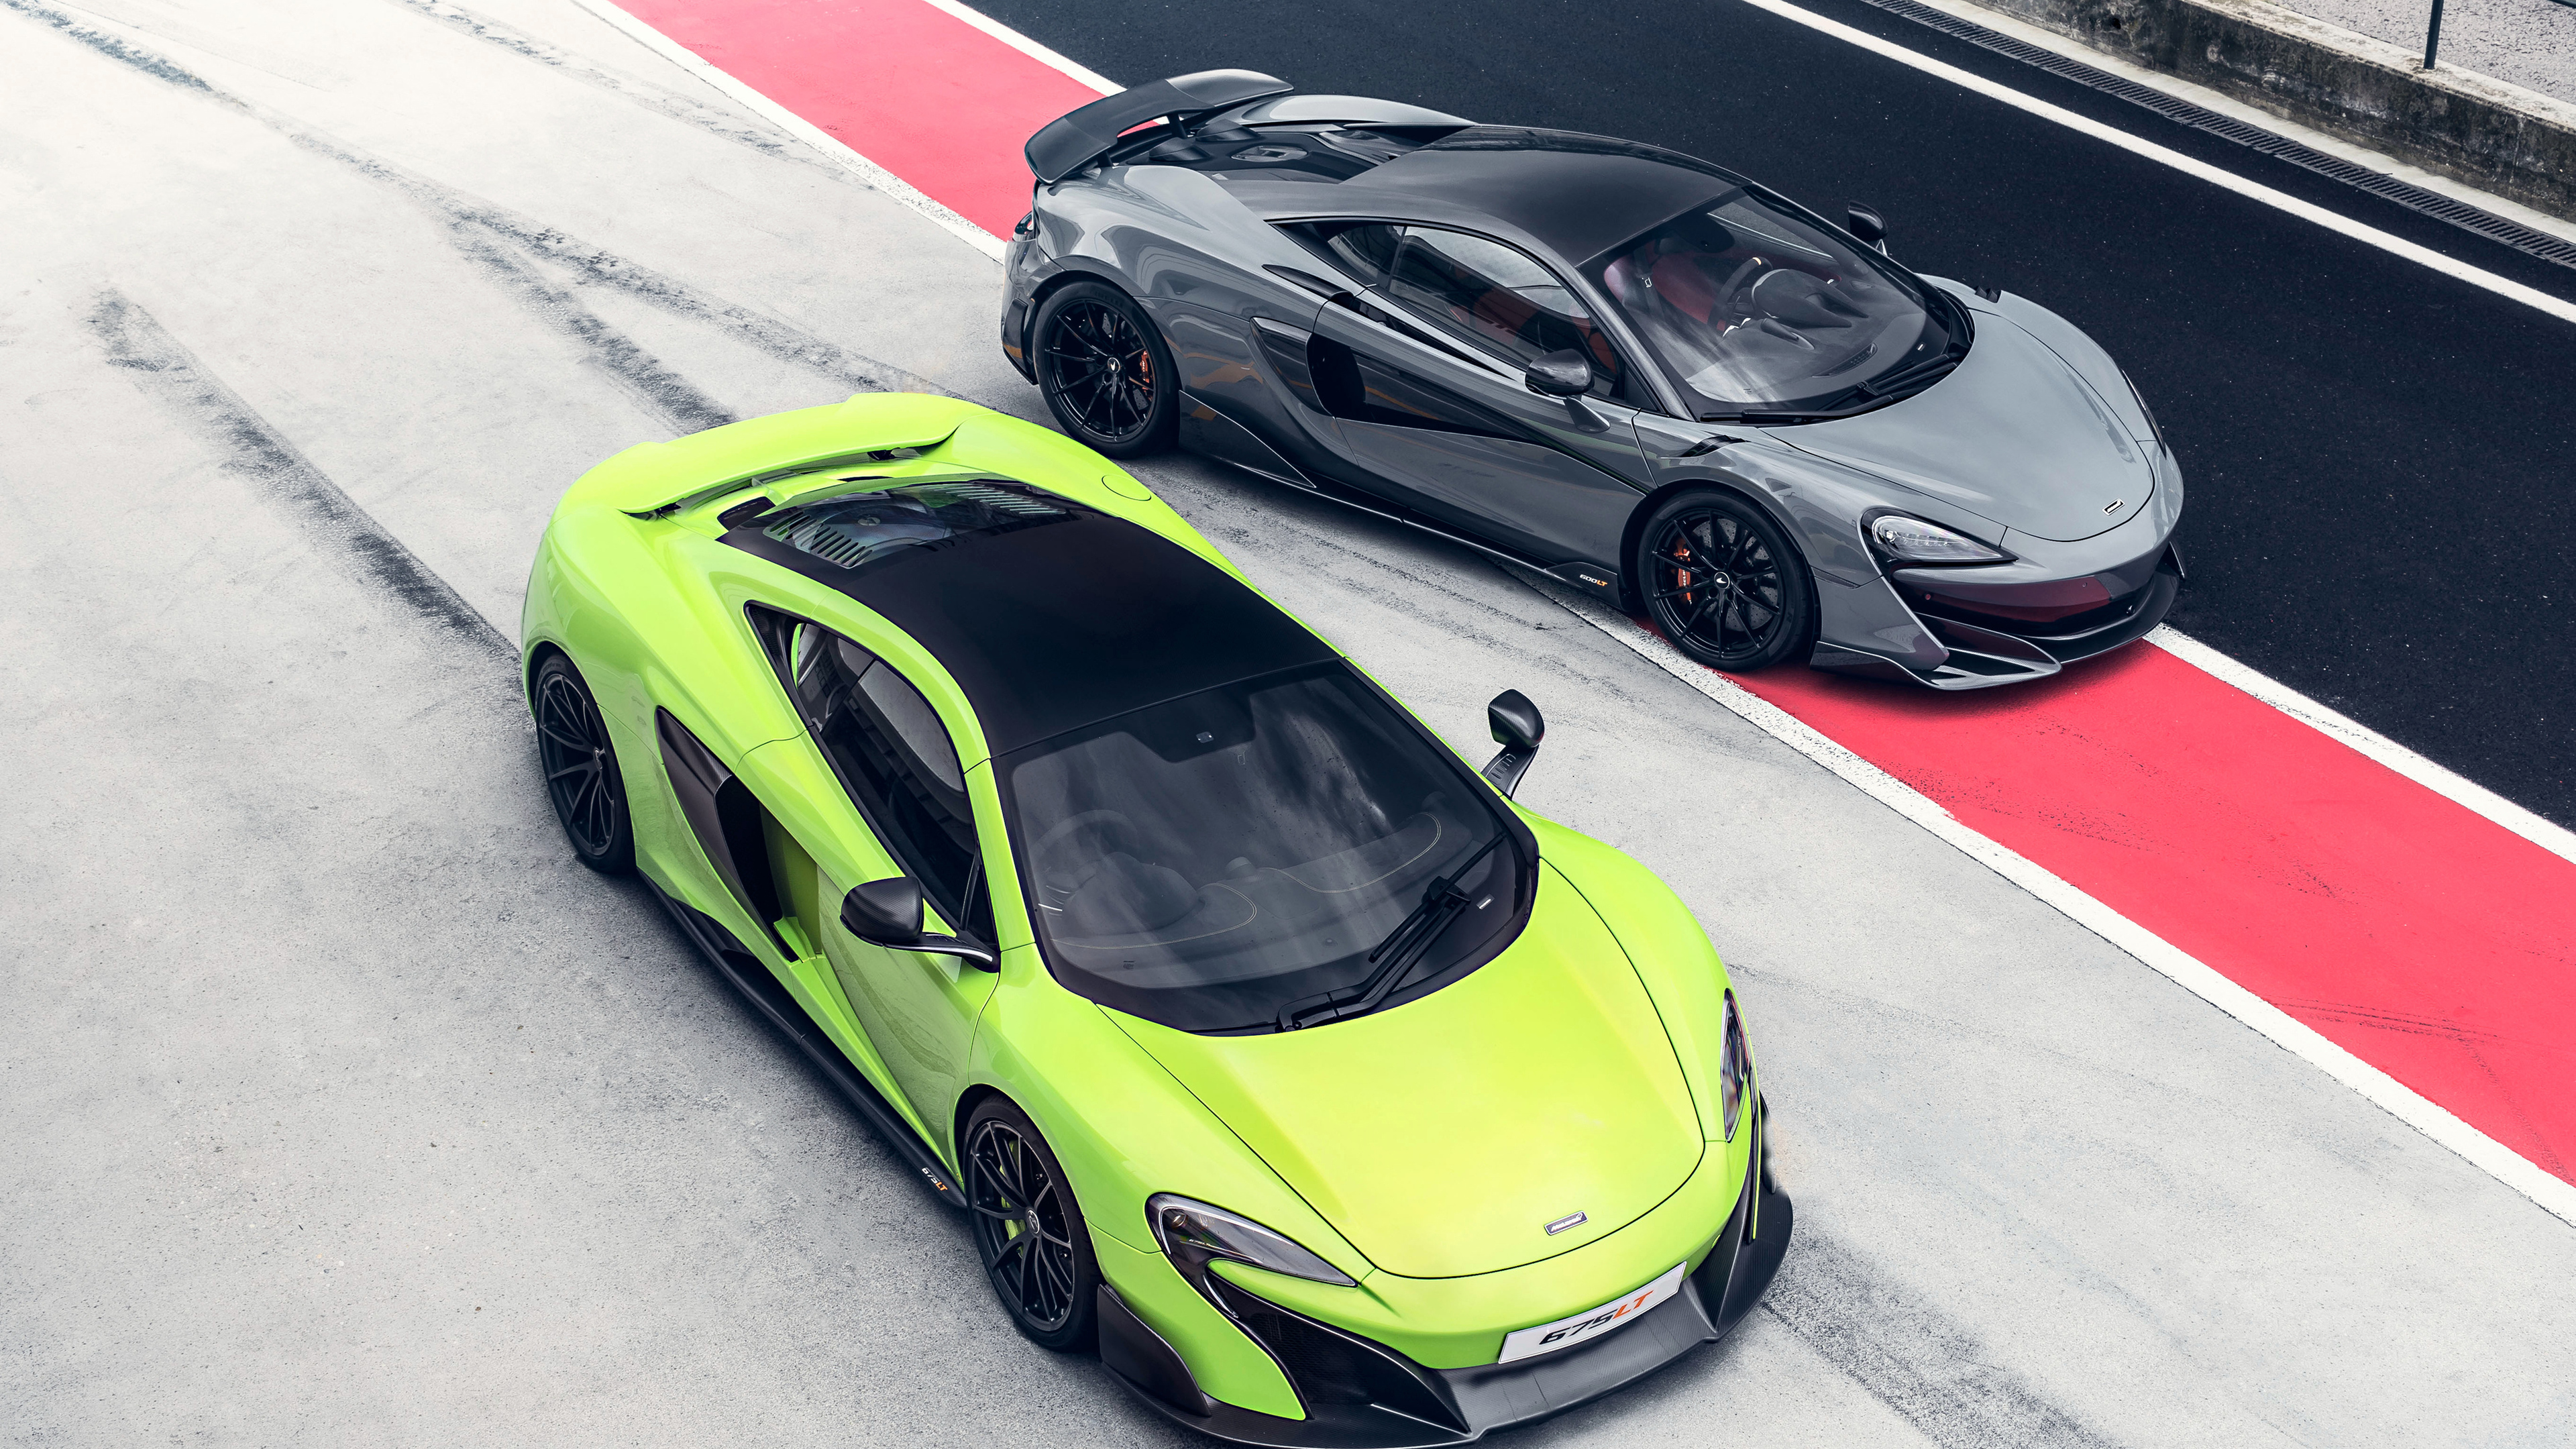 mclaren 675lt and 600lt 4k 1547936901 - McLaren 675LT And 600LT 4k - mclaren wallpapers, hd-wallpapers, cars wallpapers, 4k-wallpapers, 2018 cars wallpapers